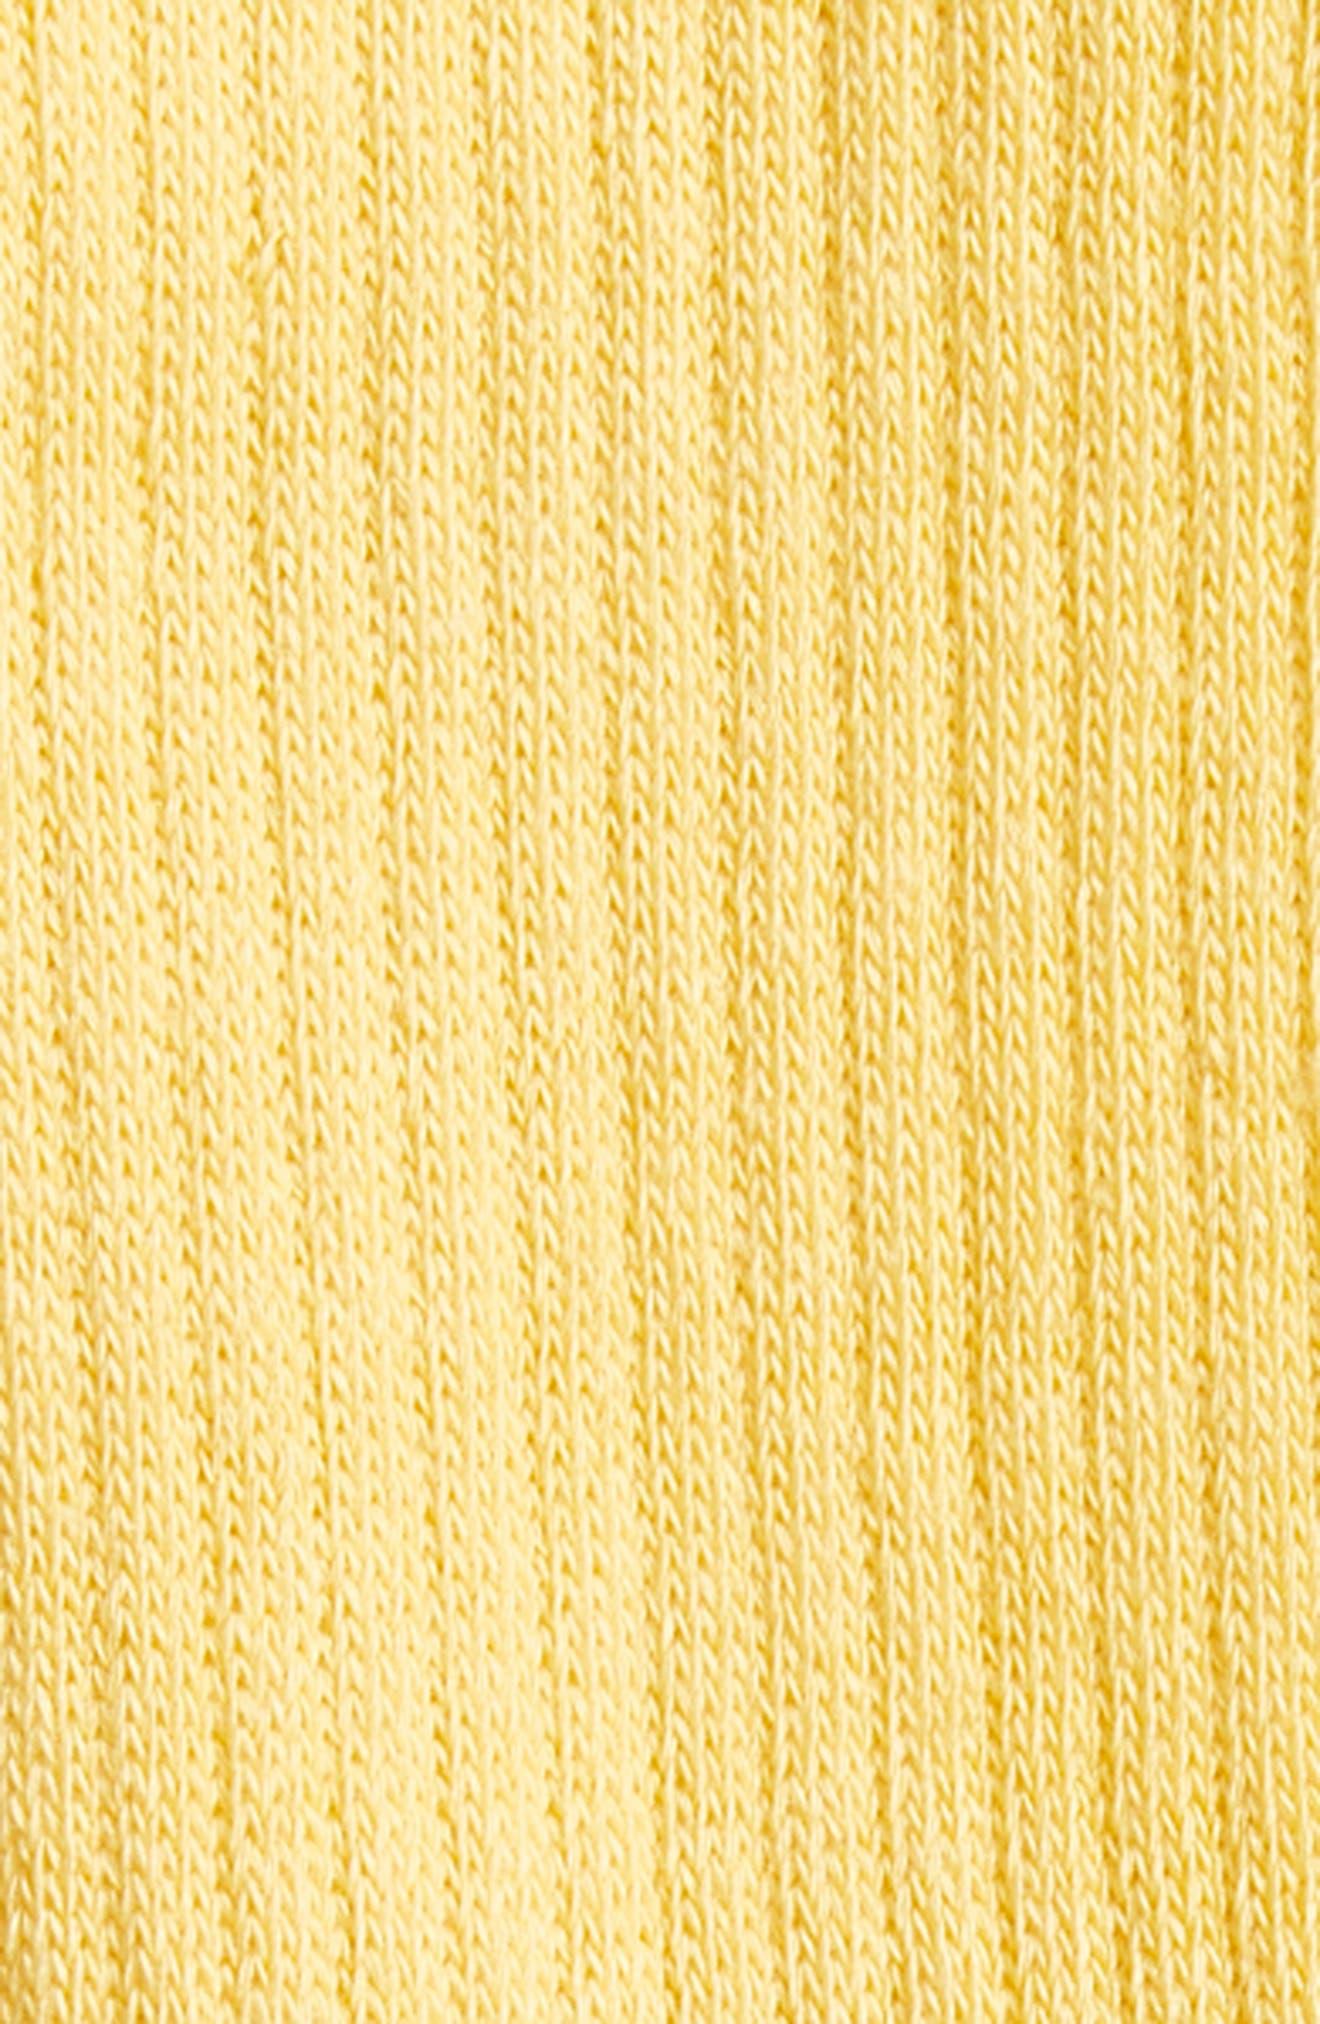 Everyday Crew Socks,                             Alternate thumbnail 3, color,                             700